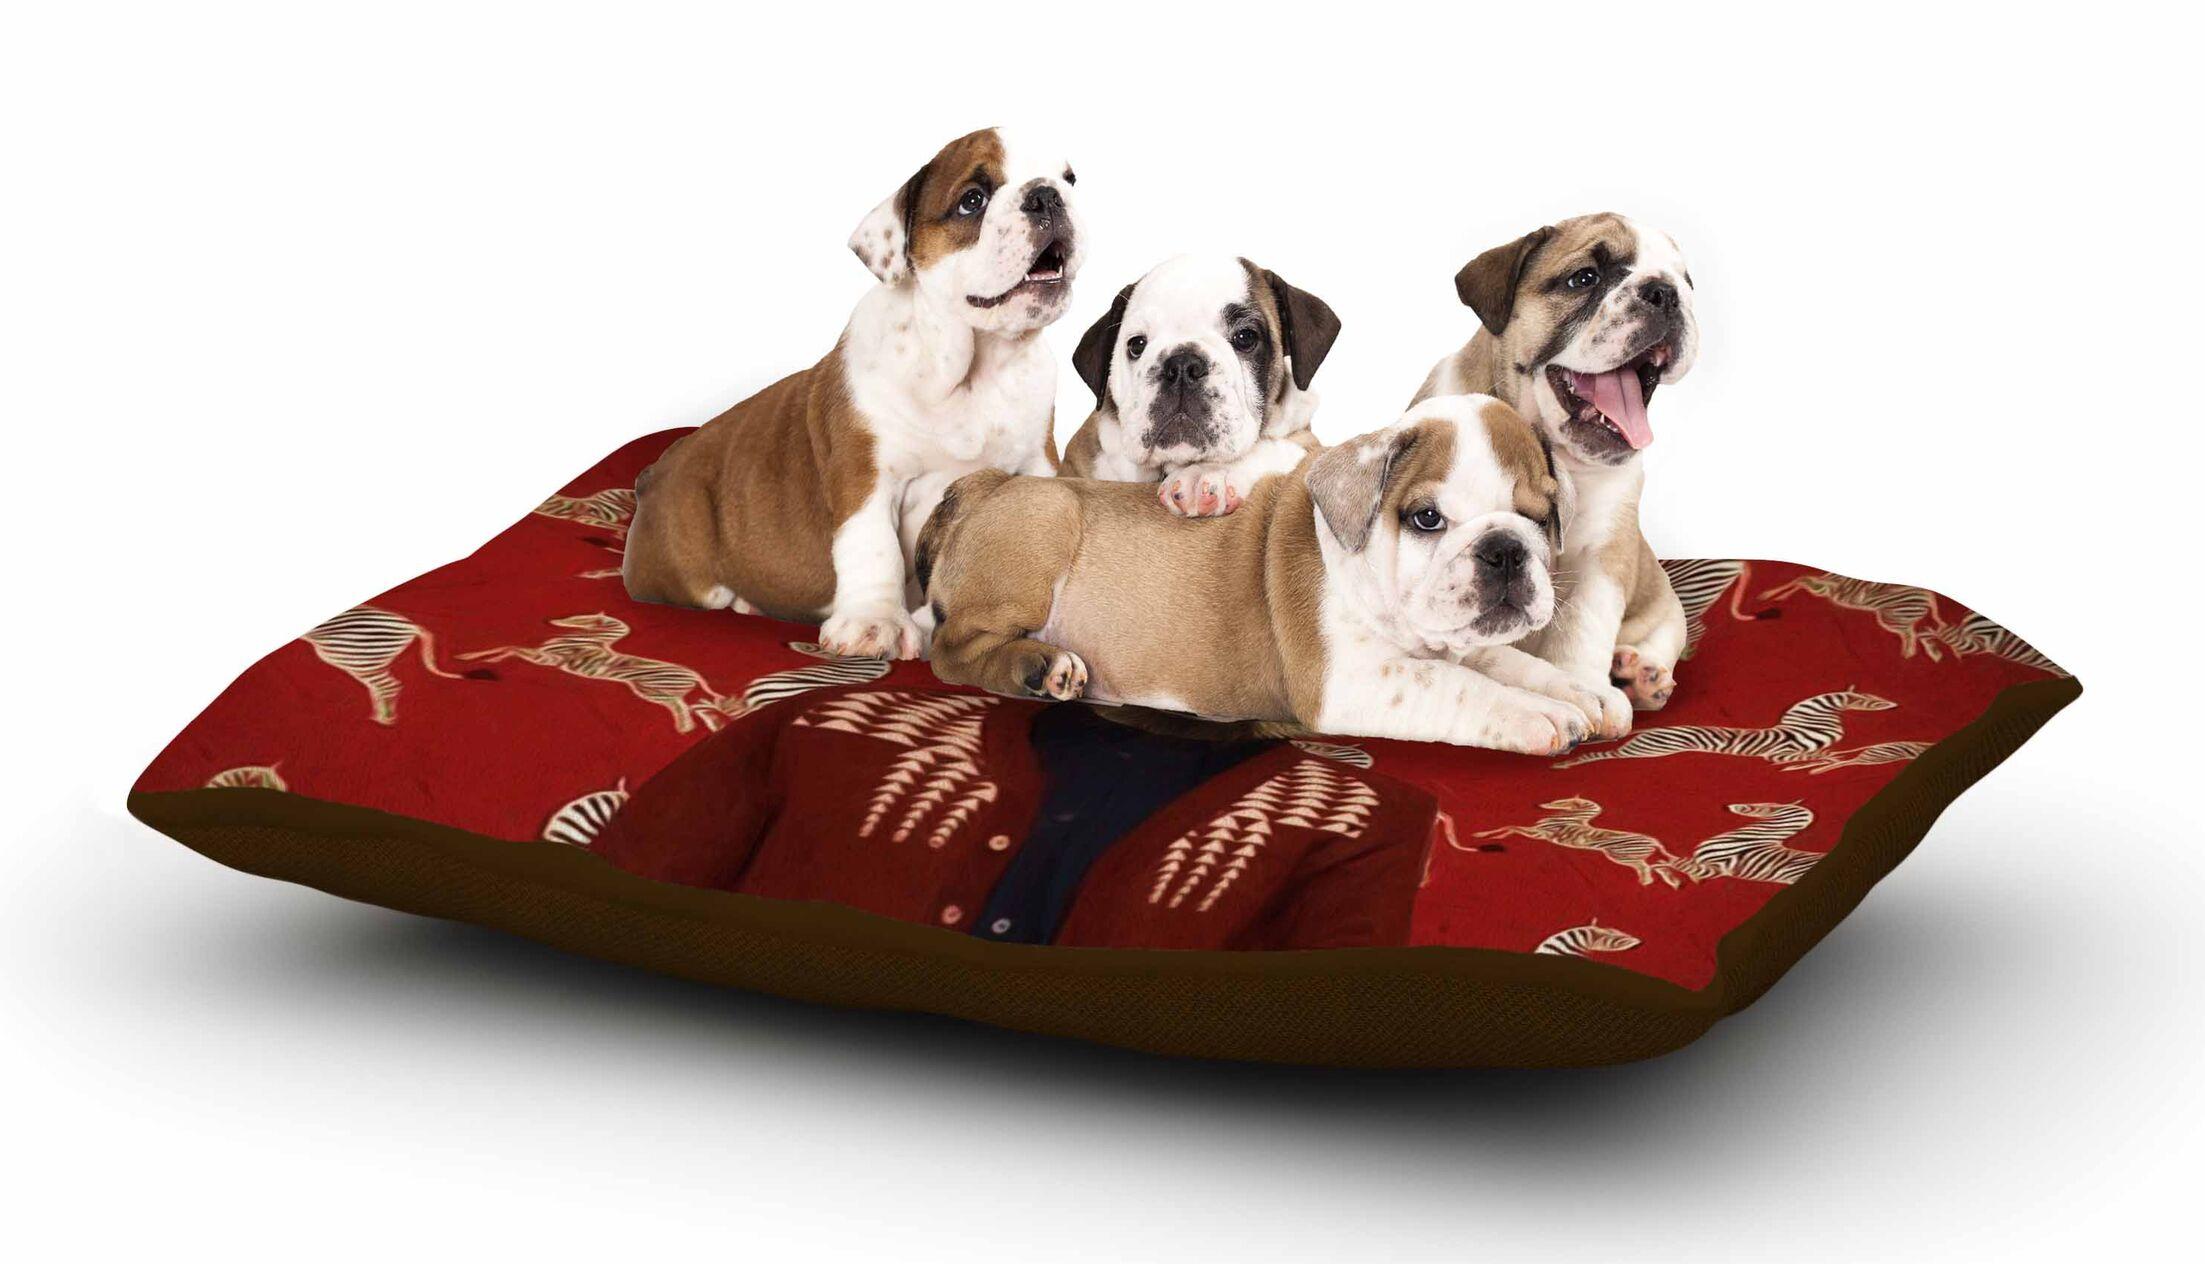 Natt 'Family Portrait N1' Fox Dog Pillow with Fleece Cozy Top